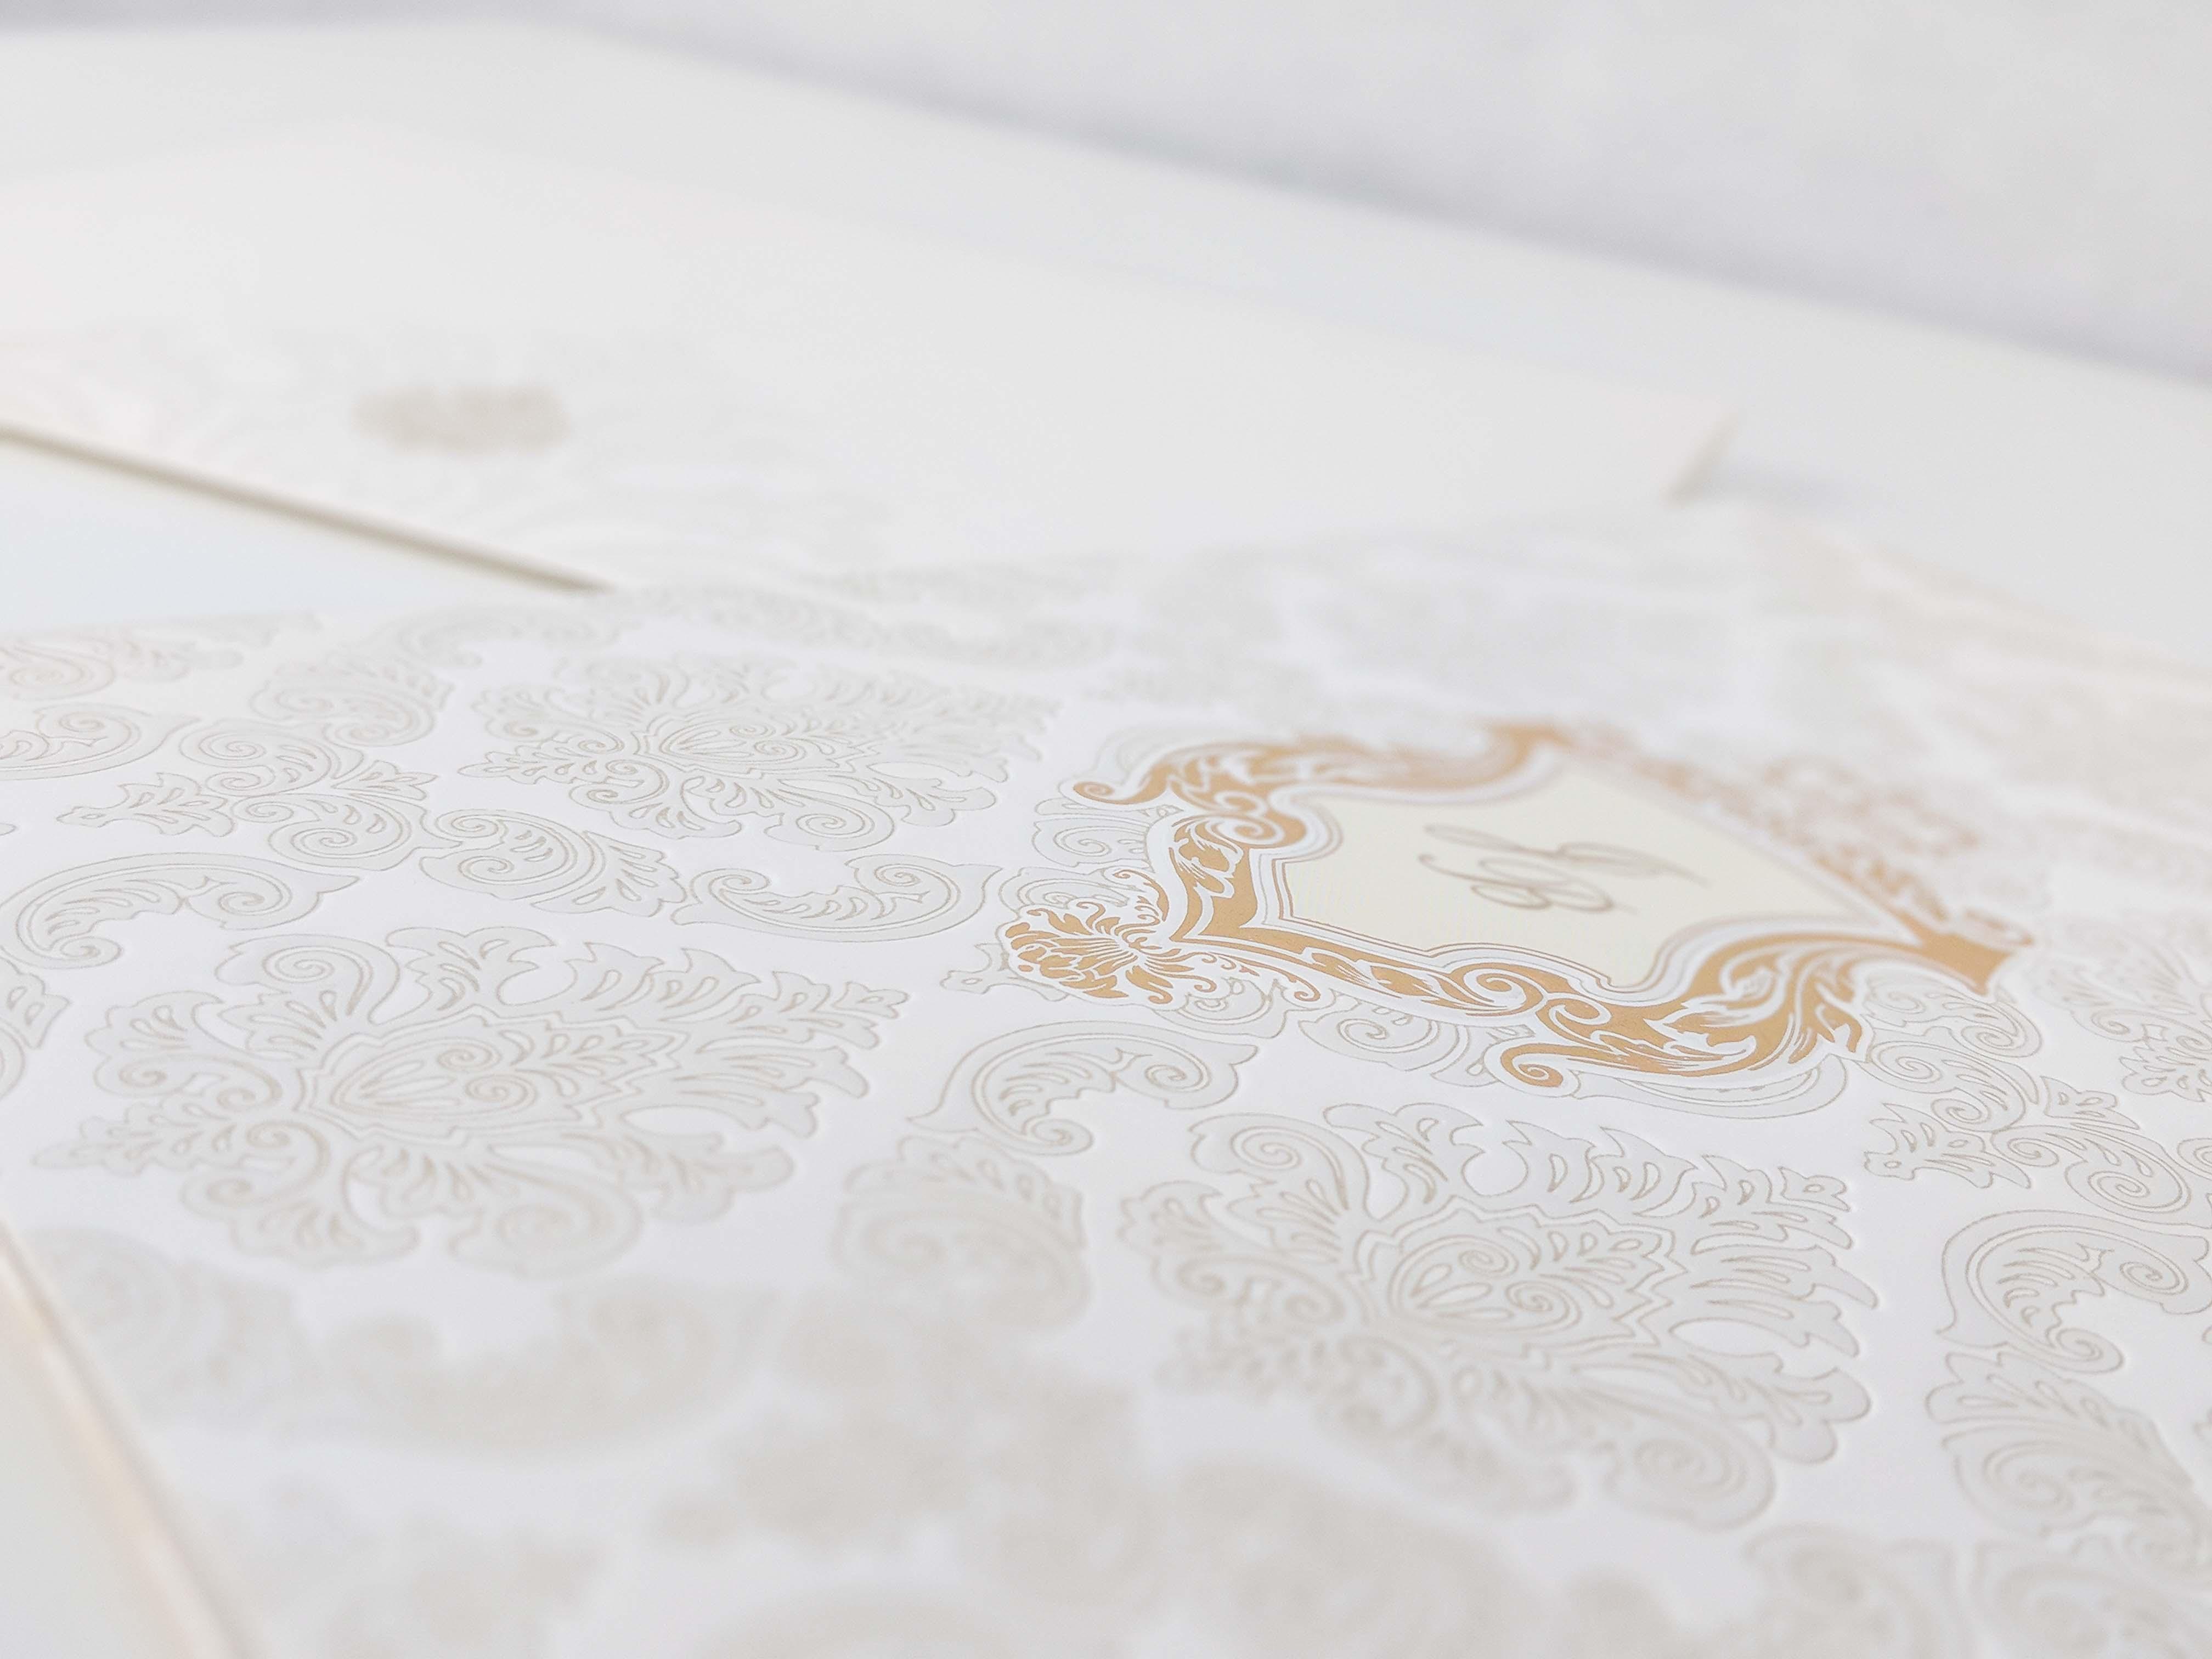 Sikh Wedding Cards - Punjabi Wedding Cards in UK by Cardeva